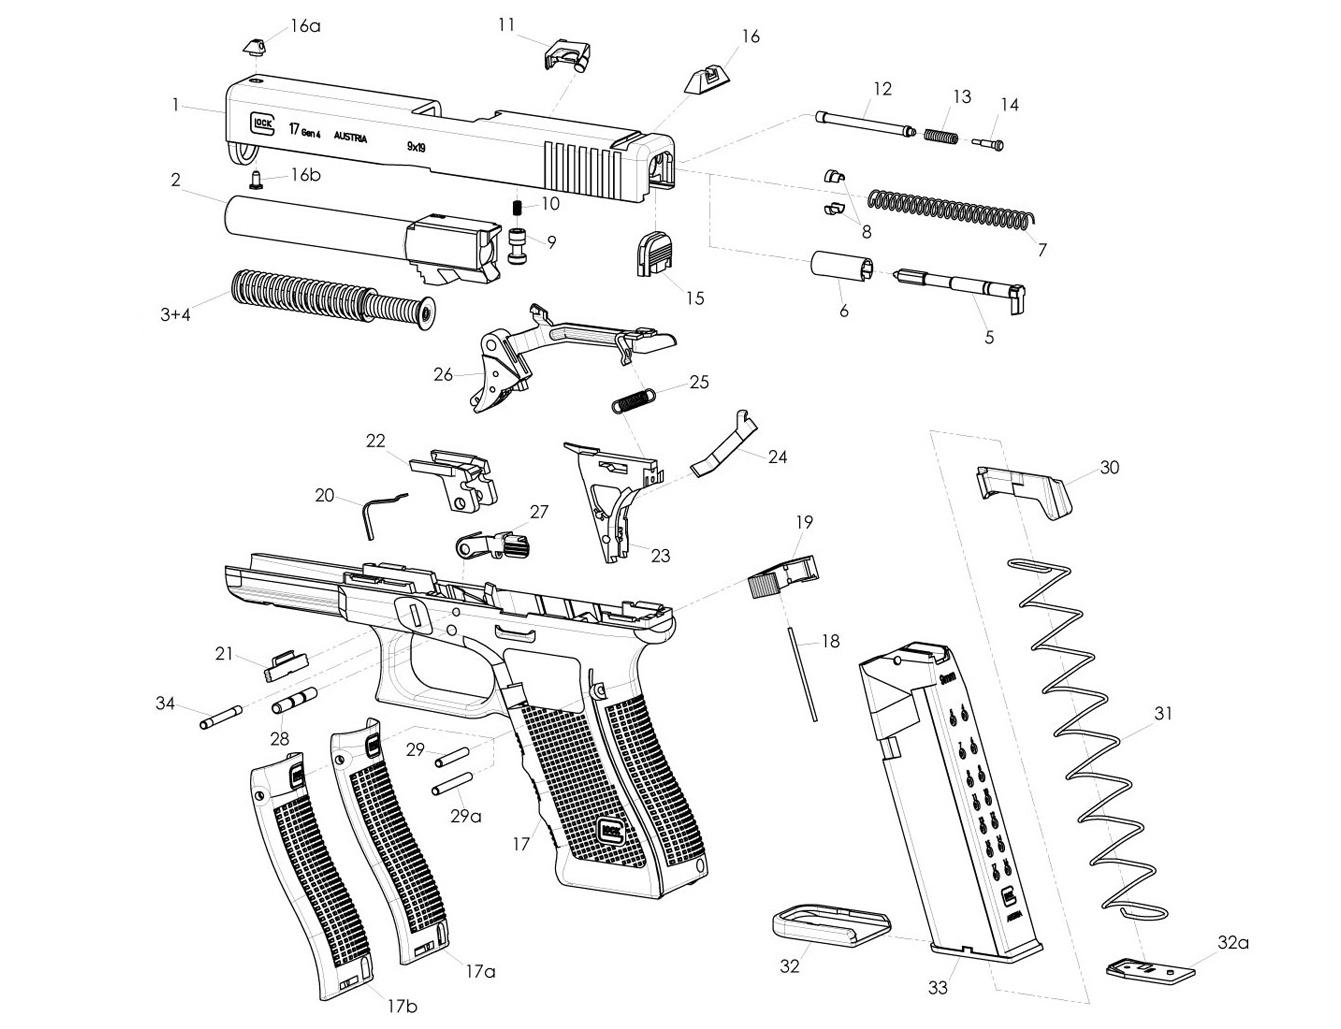 hight resolution of glock 19 parts diagram wiring diagram list glock schematic diagram moreover glock 17 parts diagram